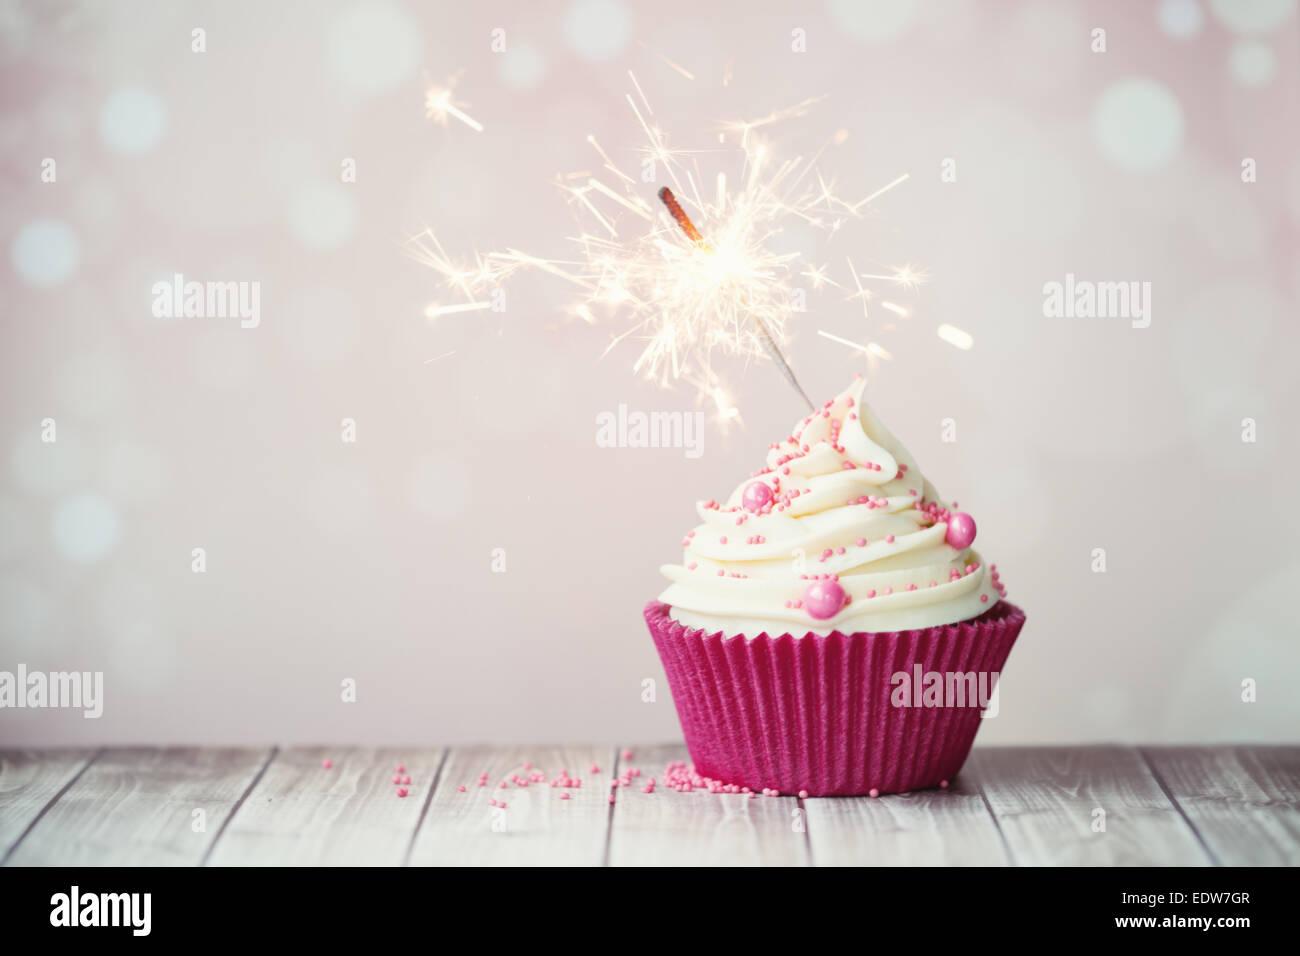 Rosa Geburtstag Cupcake Mit Wunderkerze Stockfoto Bild 77386759